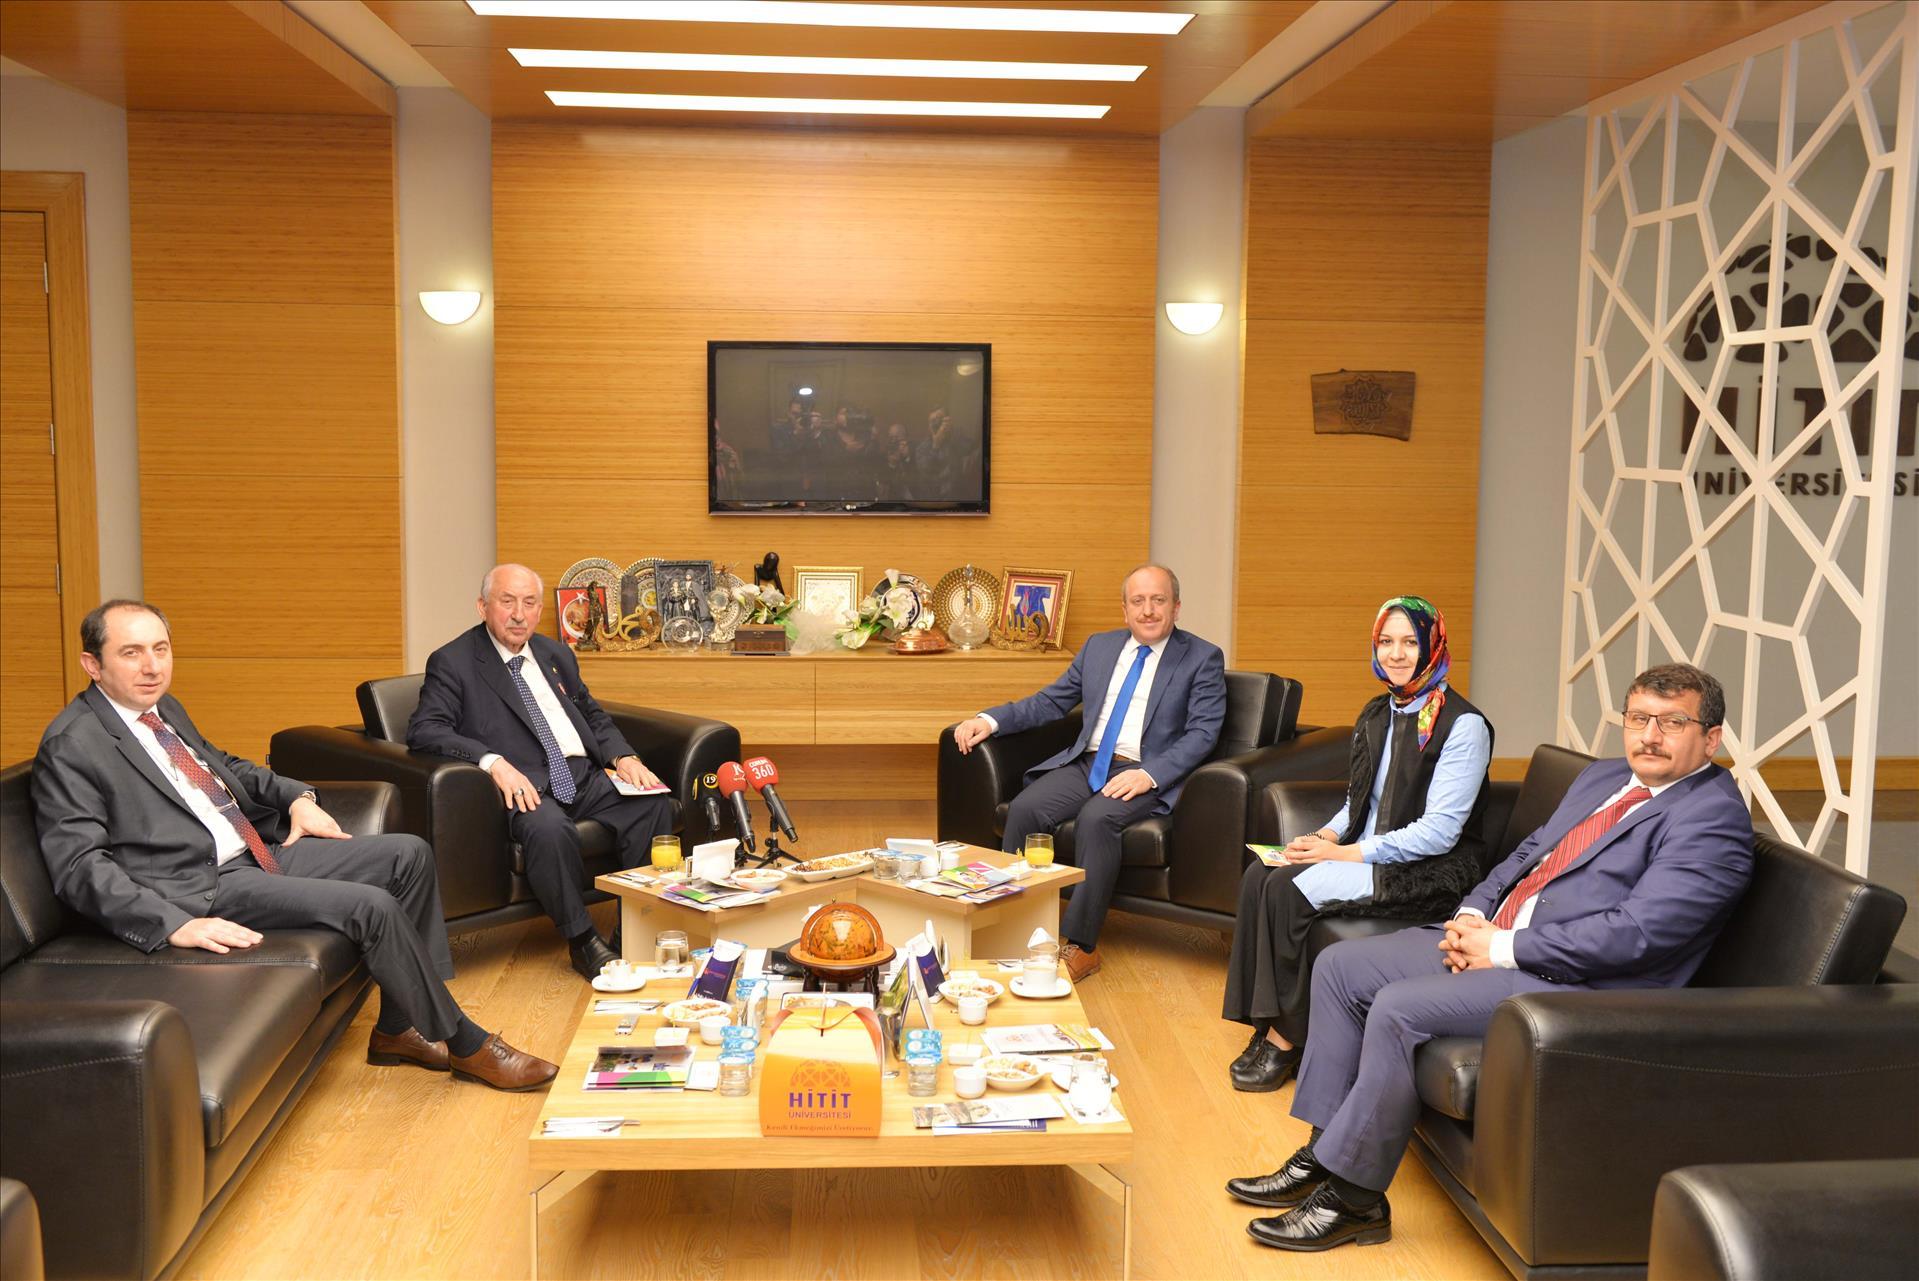 AK Parti İl Başkanlığı Heyeti Rektörümüzü Ziyaret Etti